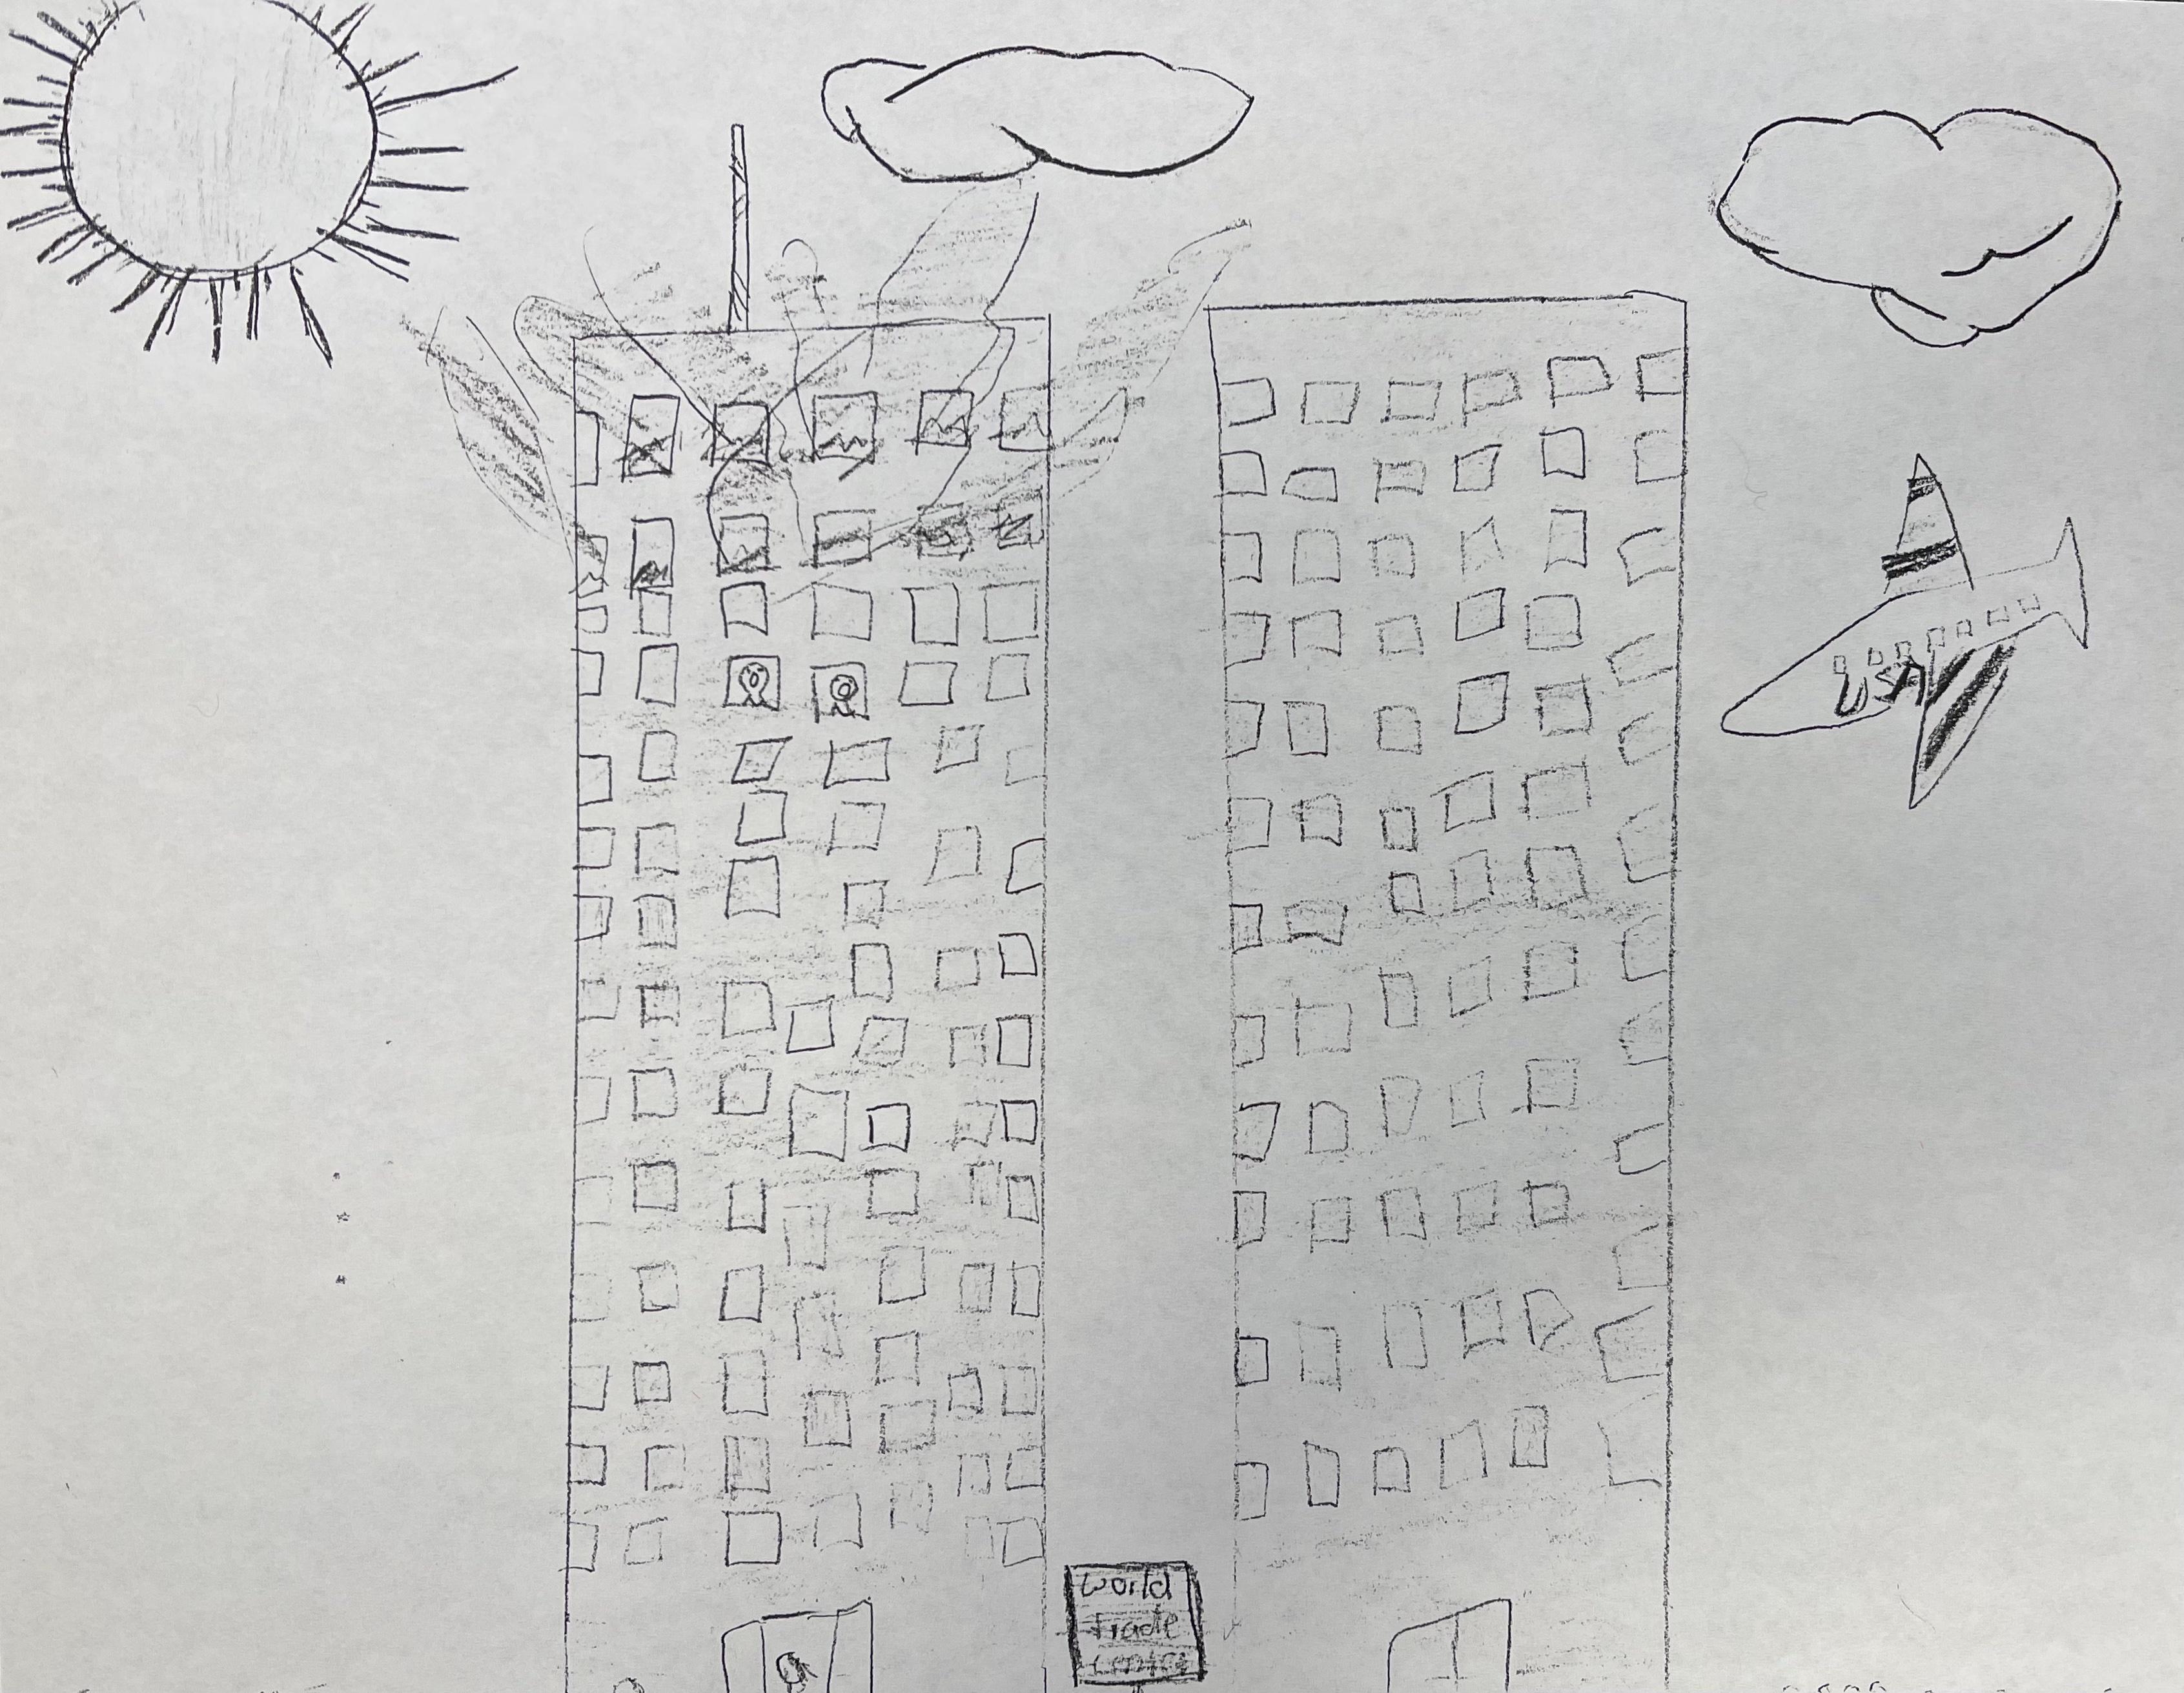 New York on 9/11